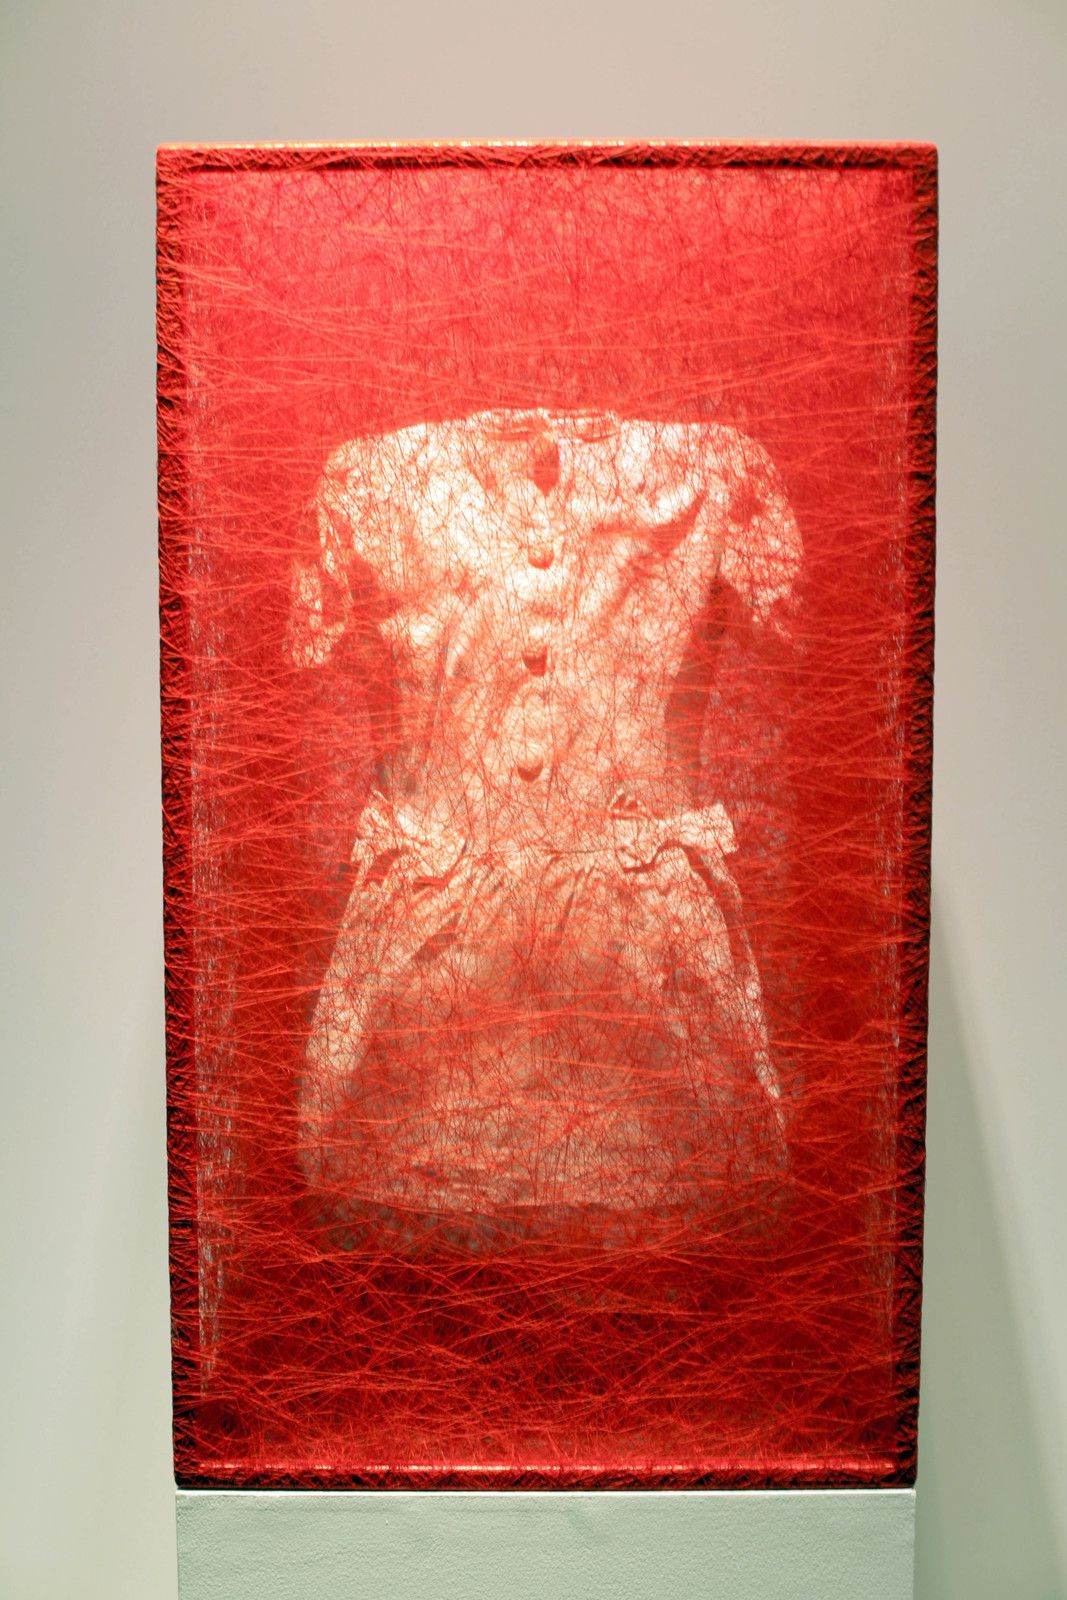 """State of Being (Dress), 2020 de Chiharu SHIOTA - Courtesy Galerie Templon Paris © Photo Éric Simon"